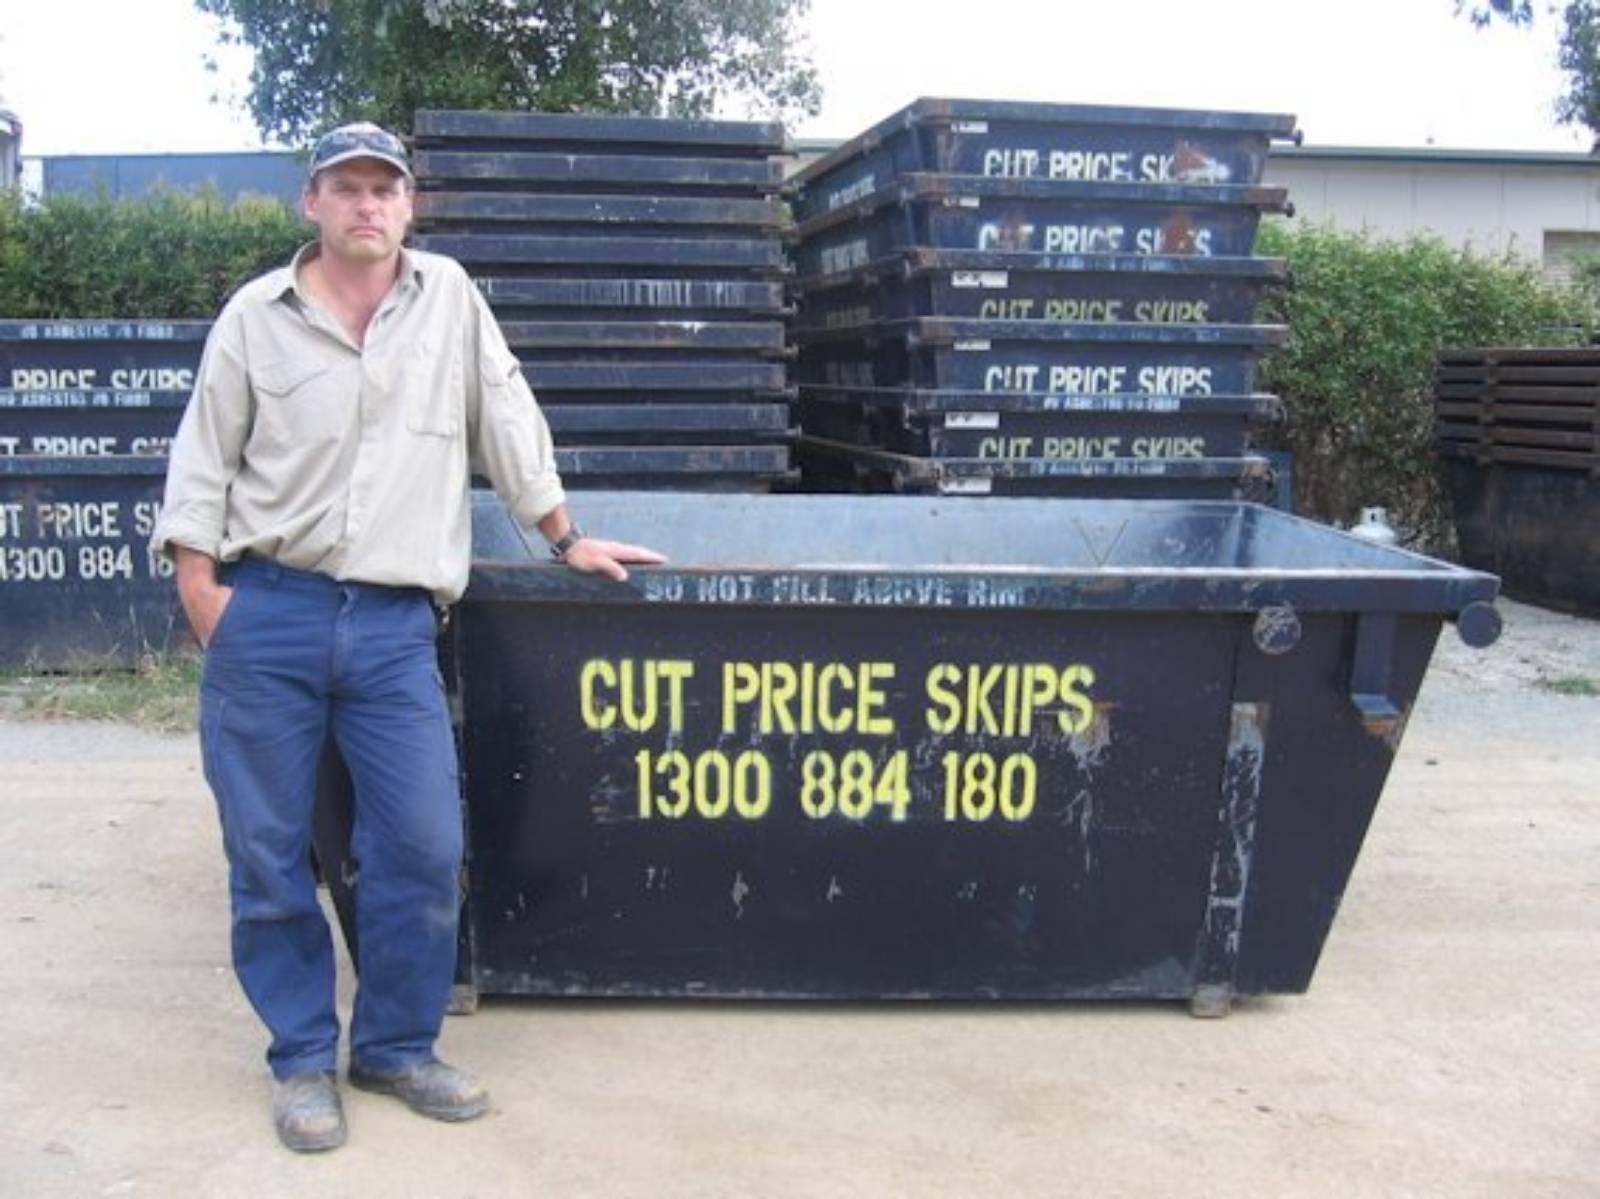 Cut Price Skips